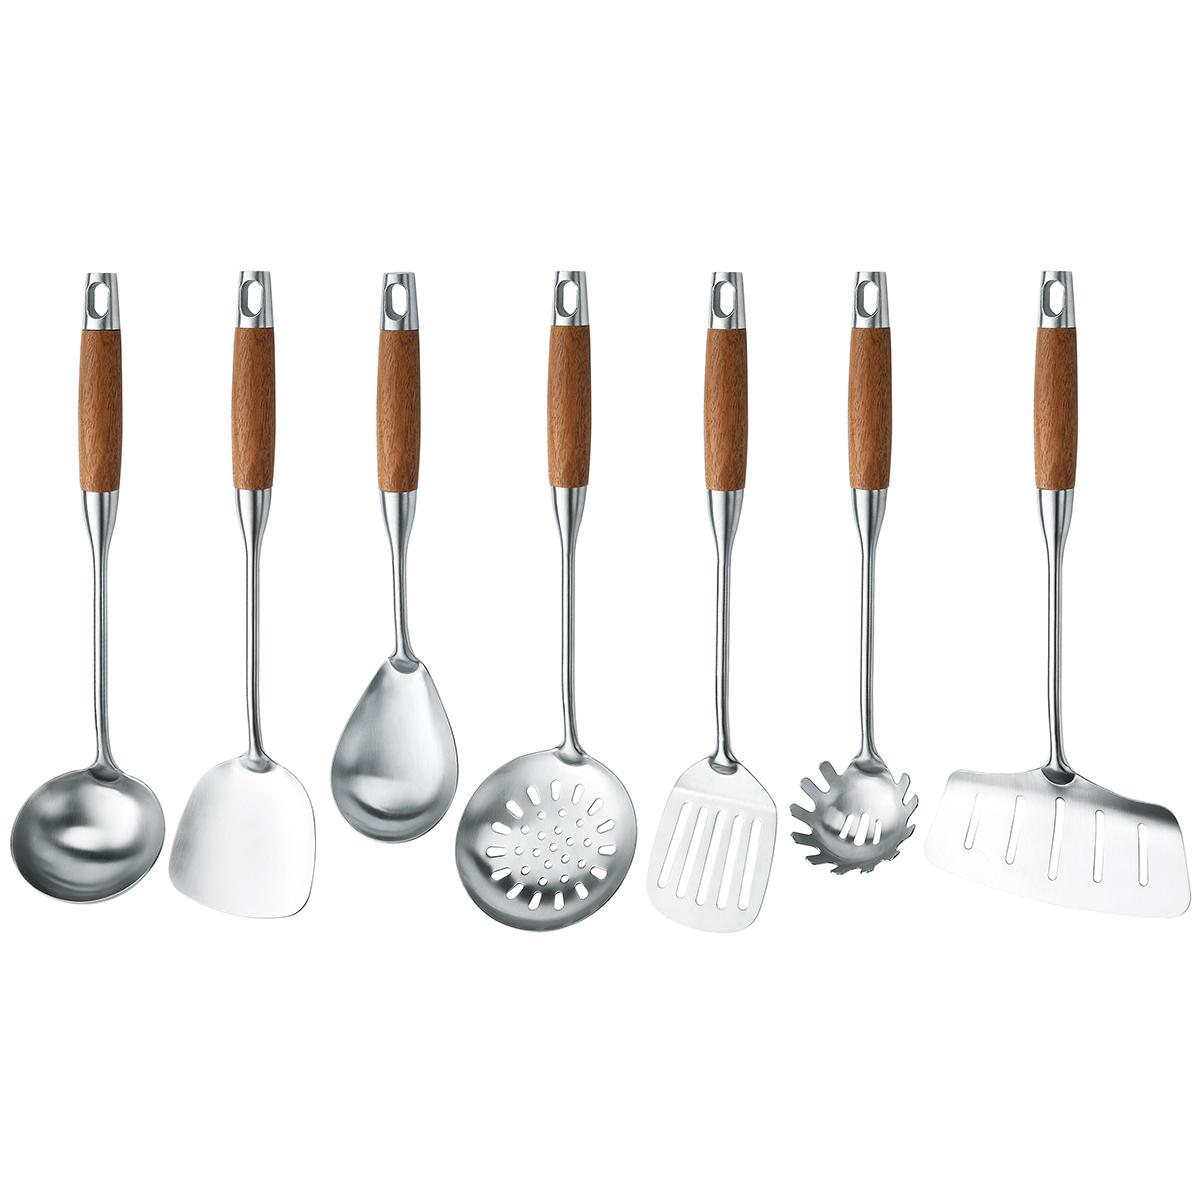 Stainless Steel 304 Wooden Handle Kitchenware Tools Utensils Set